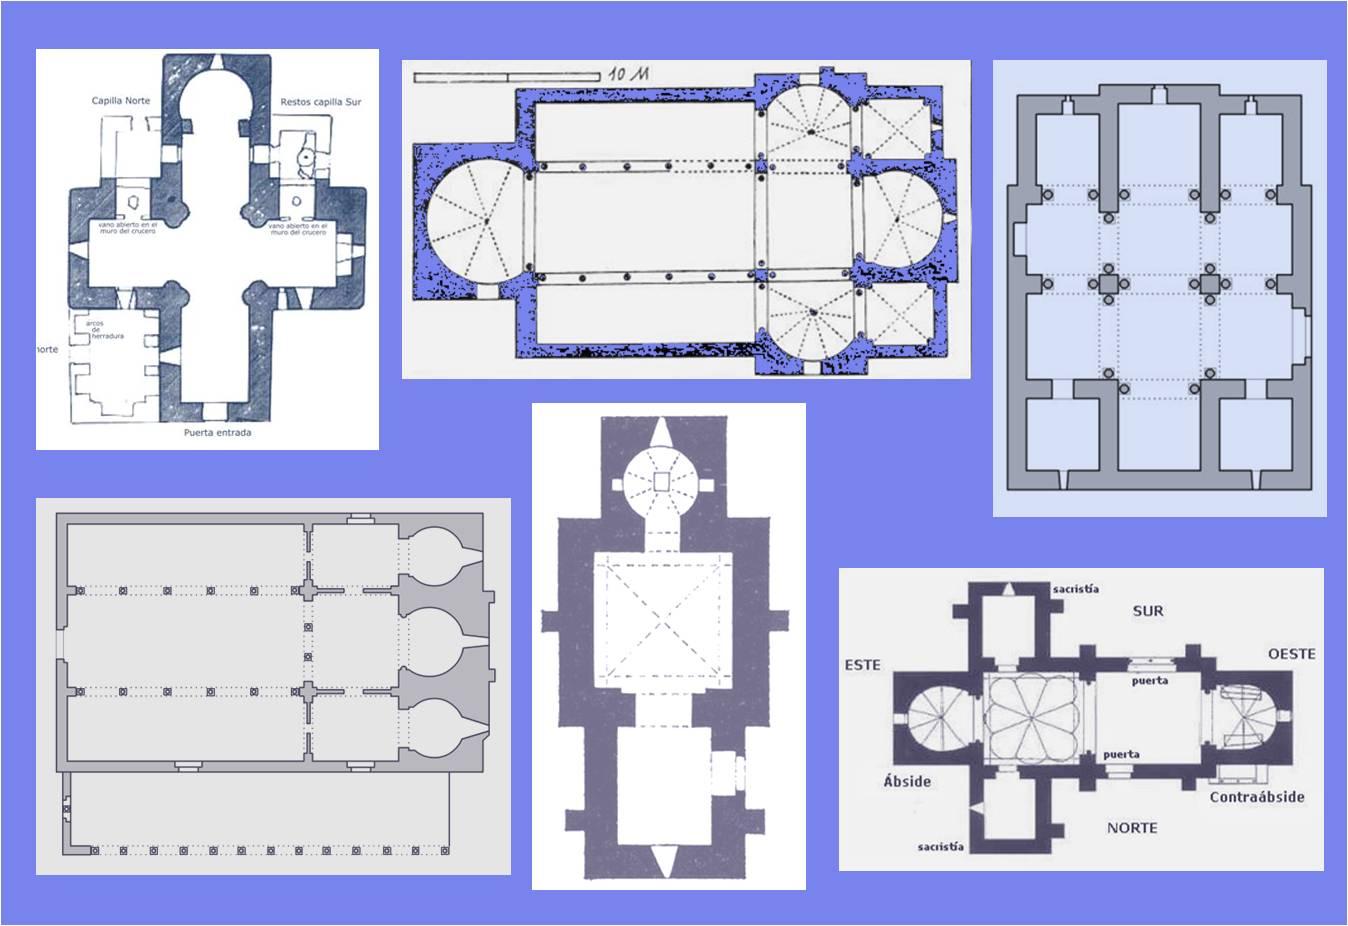 Arel arte arquitectura moz rabe for Arquitectura mozarabe